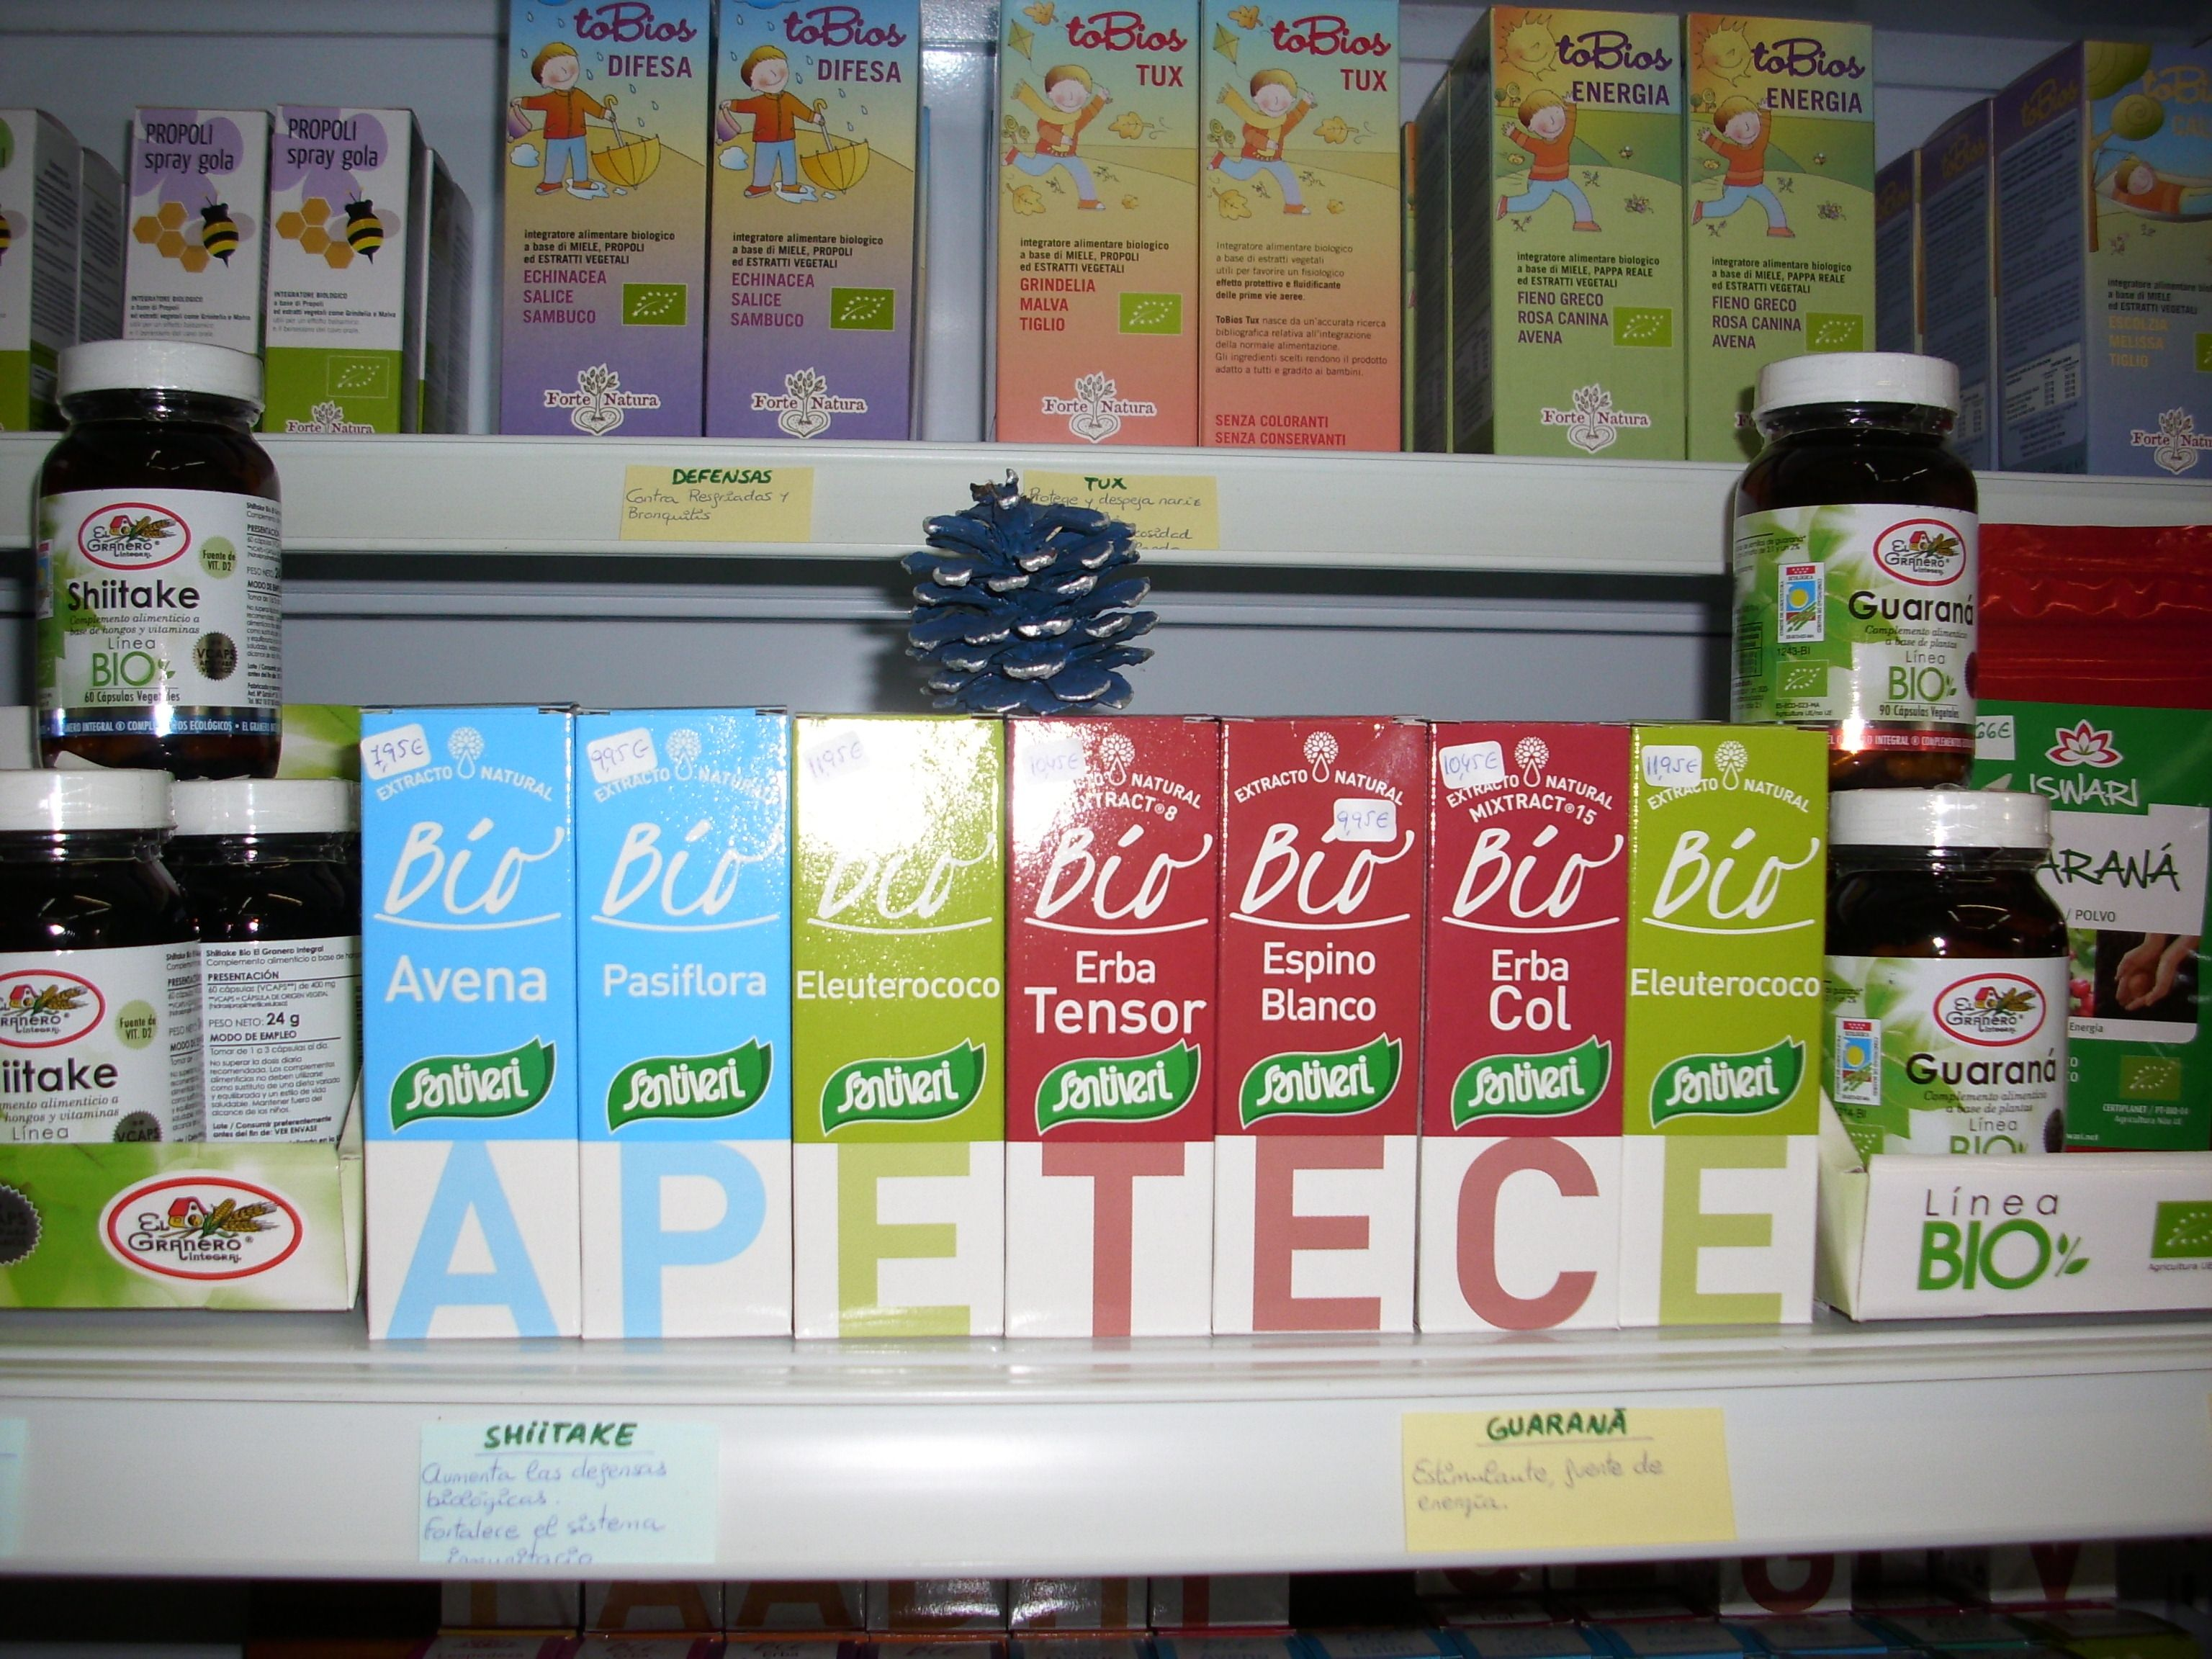 Algunos productos de Herbodietética, naturalmente Ecológicos, a vuestra disposición en APETECE ecológicos, en Camino del Pato, 16- MÁLAGA- 951-286303- Whats-app 669-765979